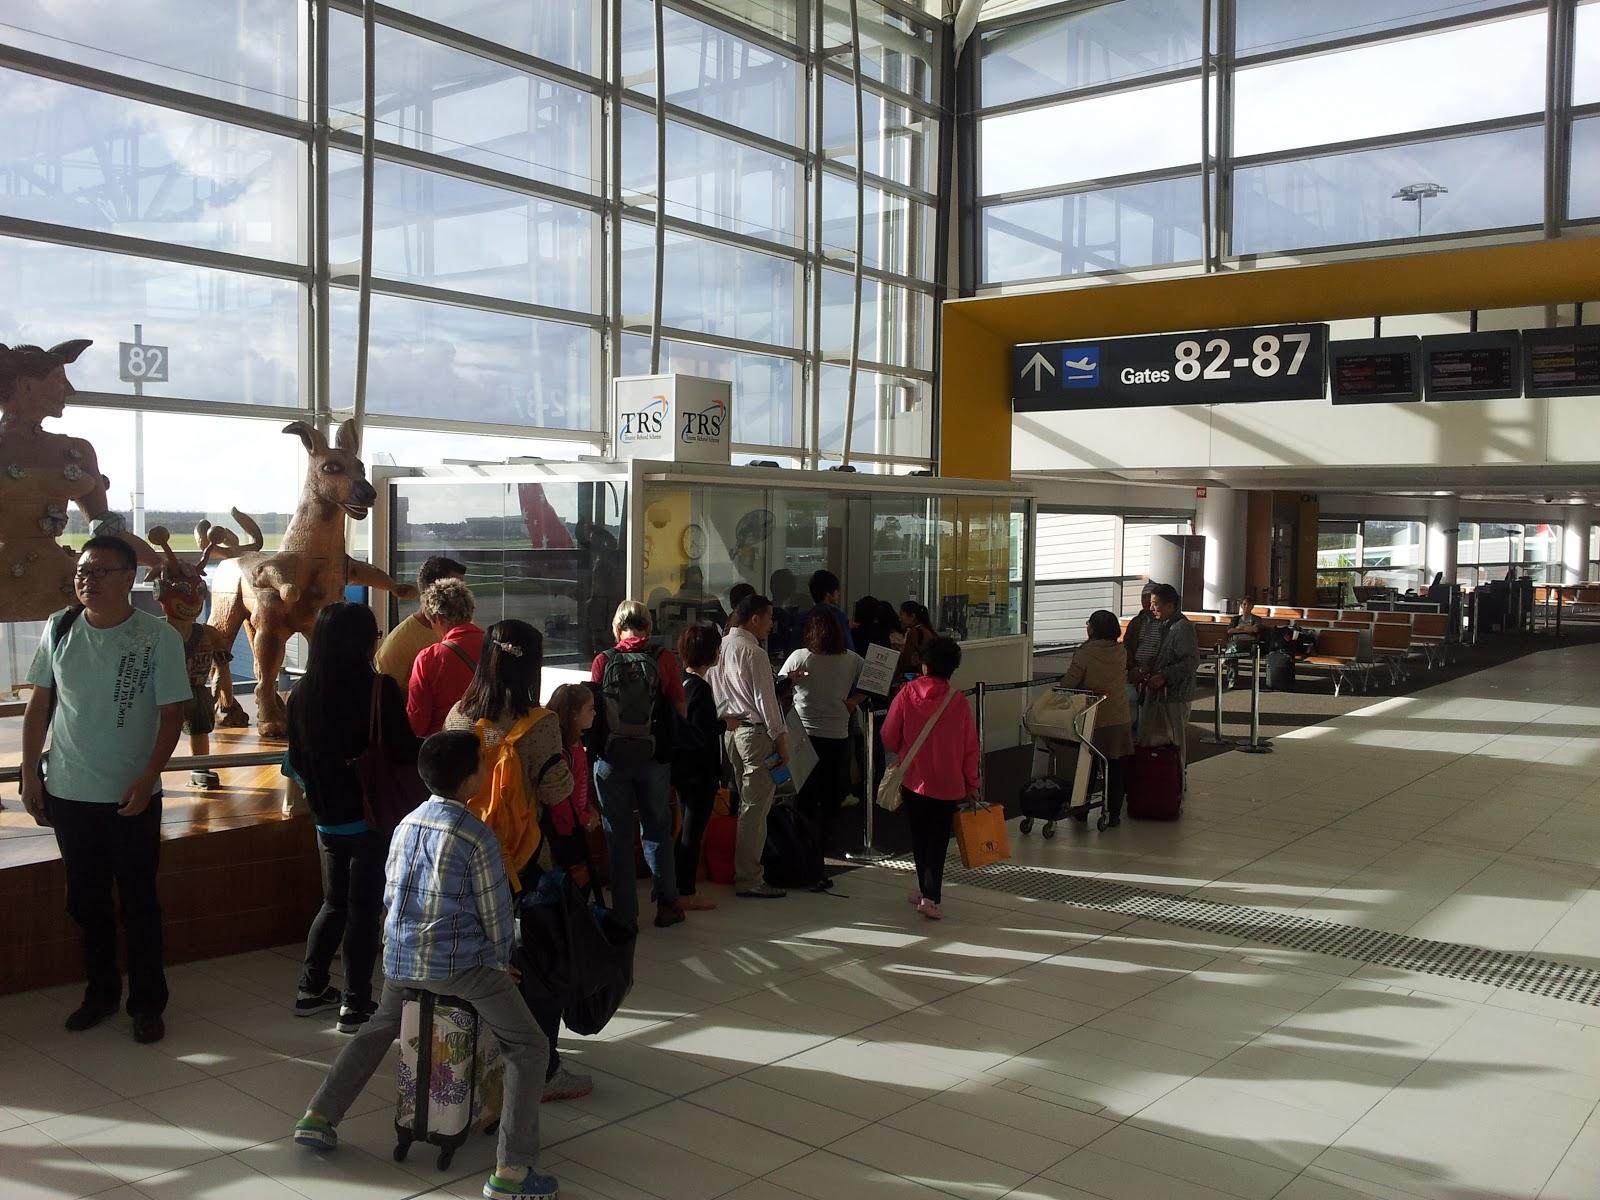 tax refund form australia at airport